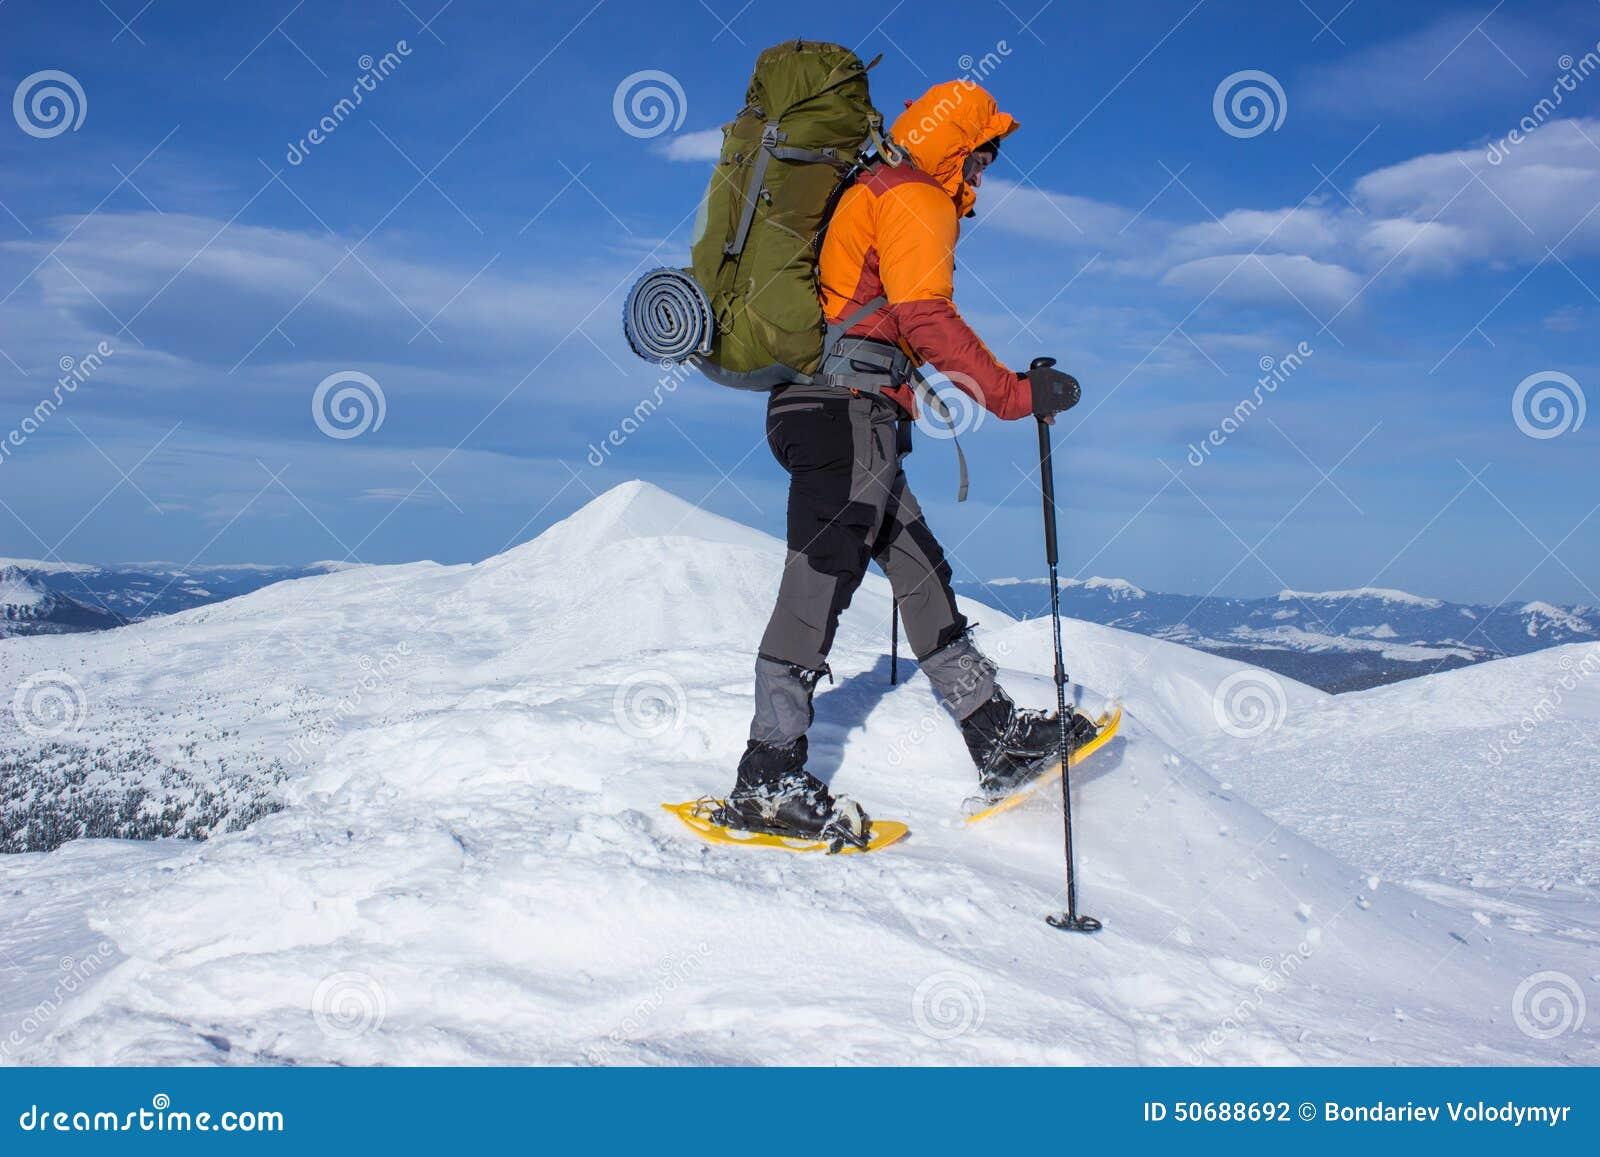 Download 在雪靴的冬天高涨 库存照片. 图片 包括有 有效地, 挑运, 设备, 空间, 云彩, 能源, 高涨, 高度 - 50688692